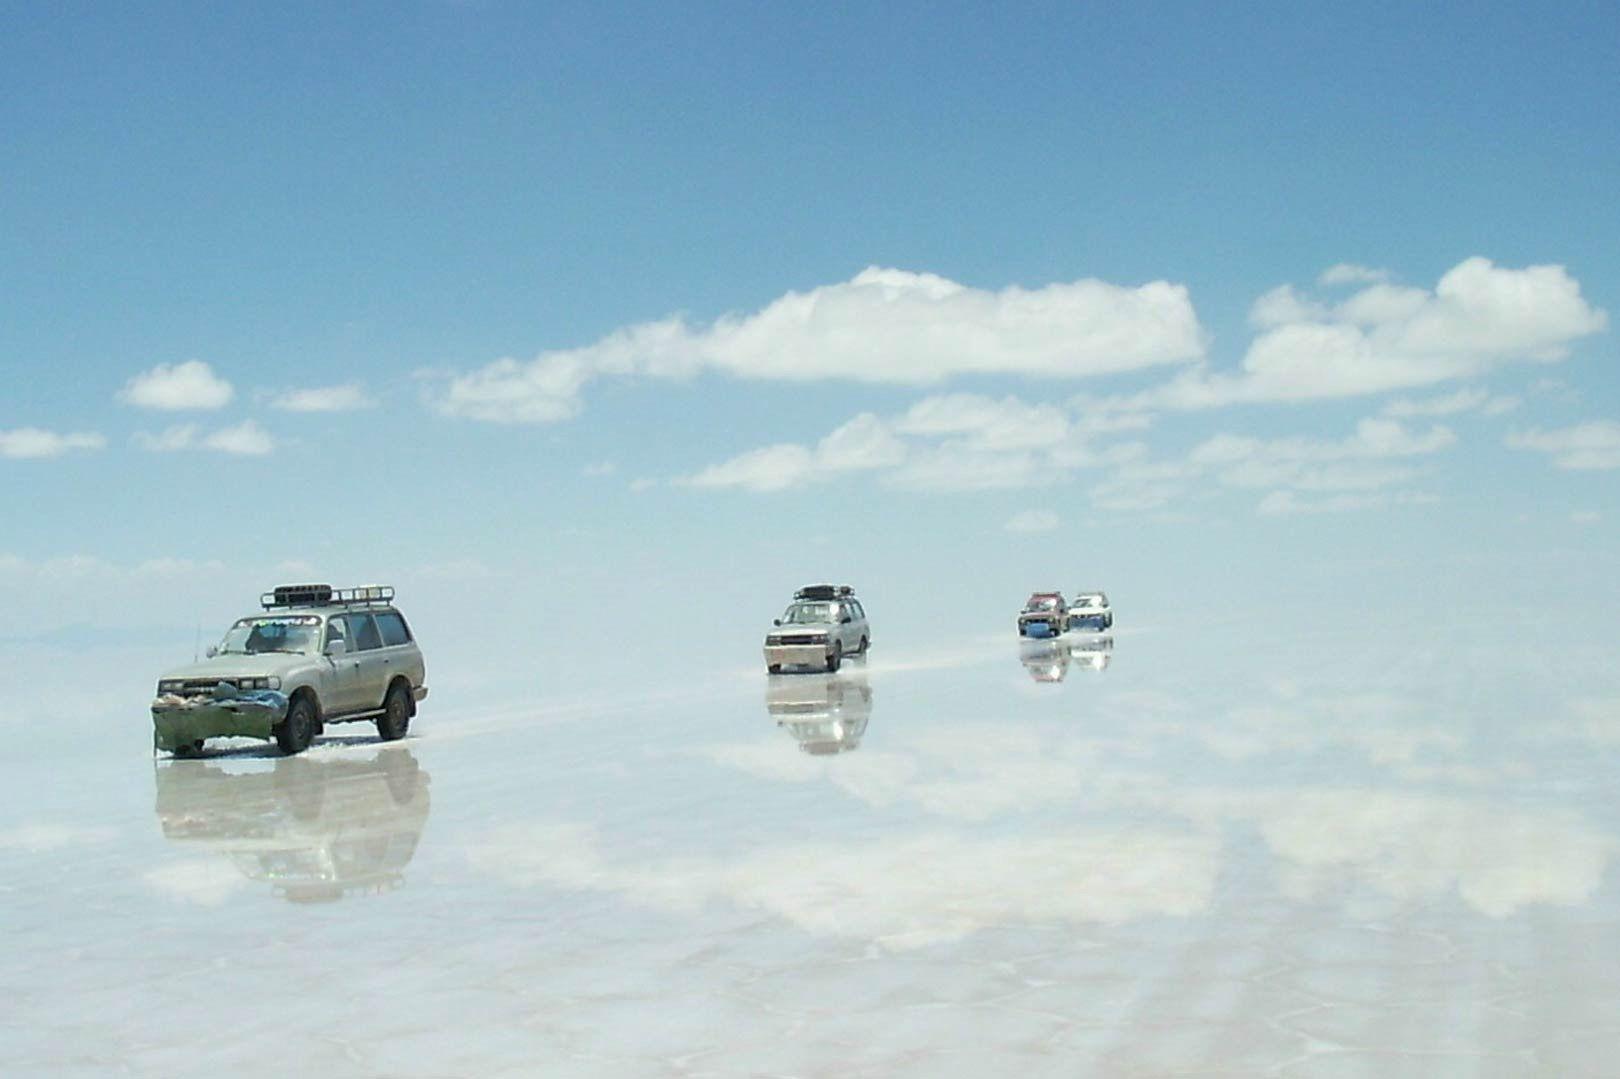 The World S Largest Salt Flat Salar De Uyuni Is Located In Southwest Bolivia At 10 582 Square Kilo Uyuni Bolivia Deserts Of The World Salar De Uyuni Bolivia